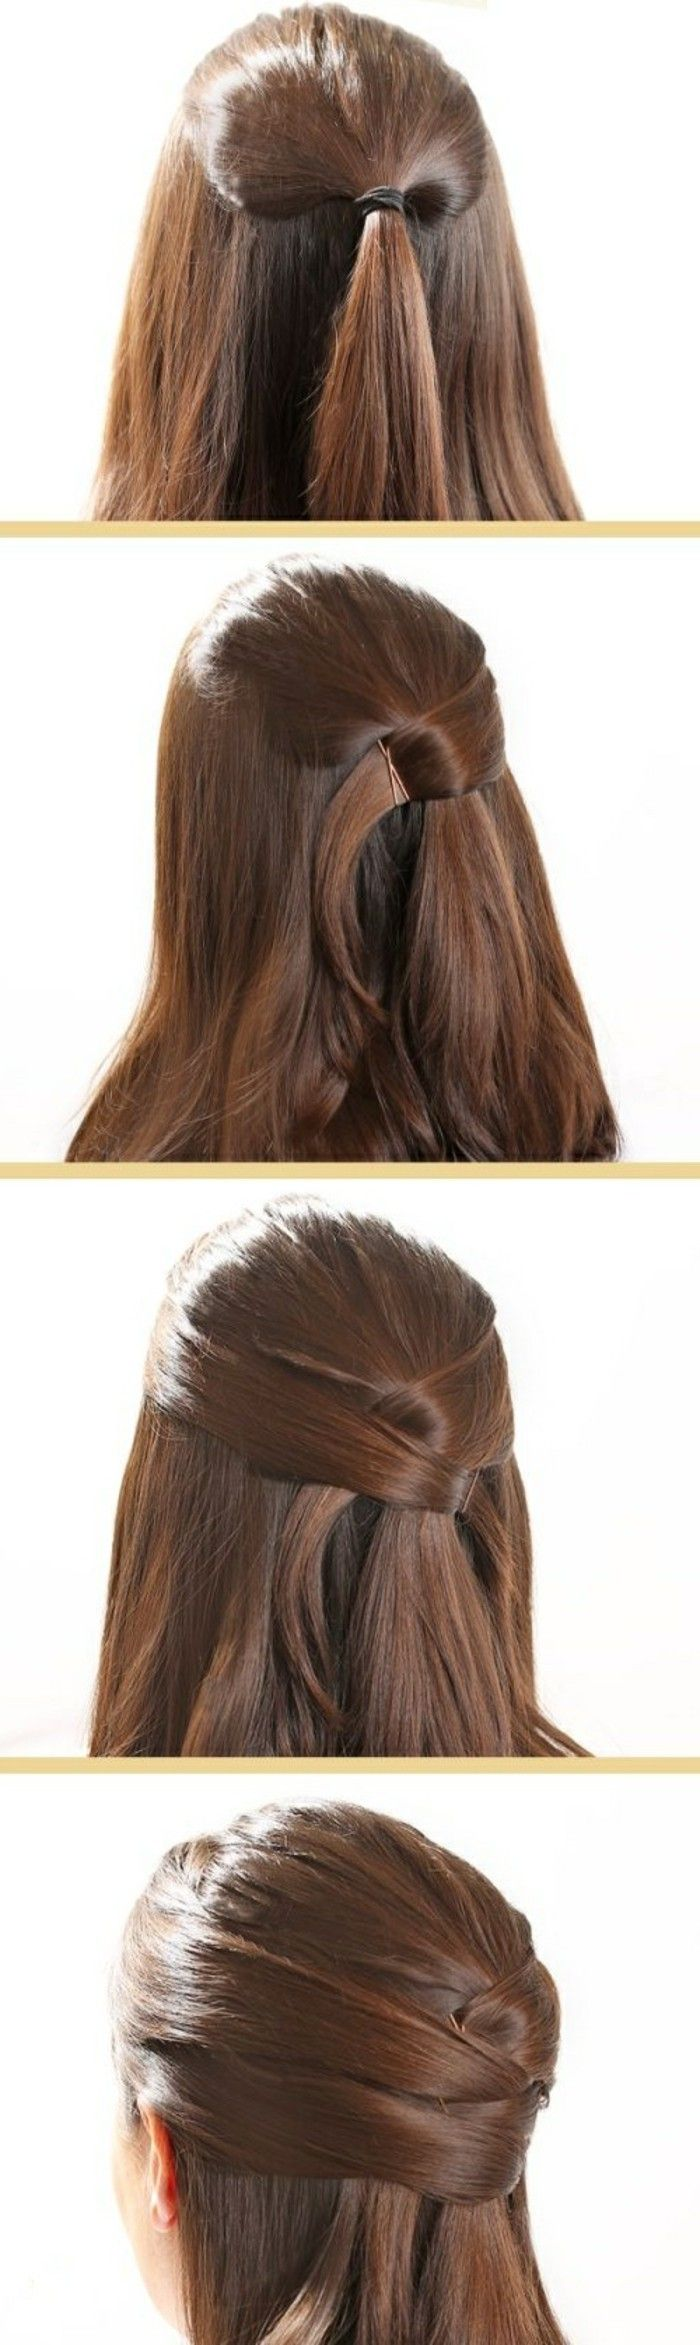 sch ne haarfrisuren f r jeden anlass haarfrisuren pinterest haarfrisuren selber machen. Black Bedroom Furniture Sets. Home Design Ideas